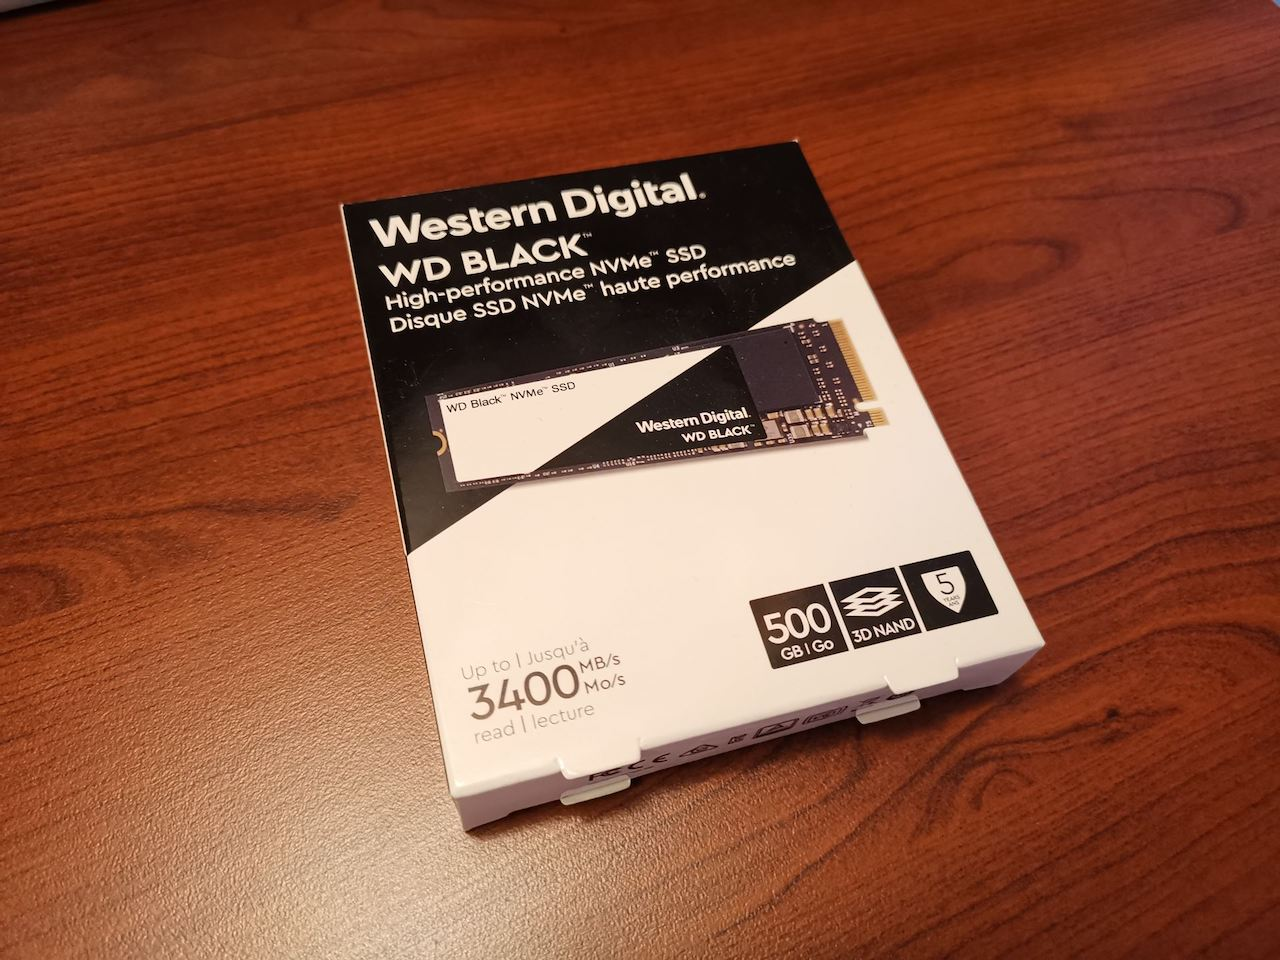 Обзор и тестирование WD Black NVMe SSD 500 GB